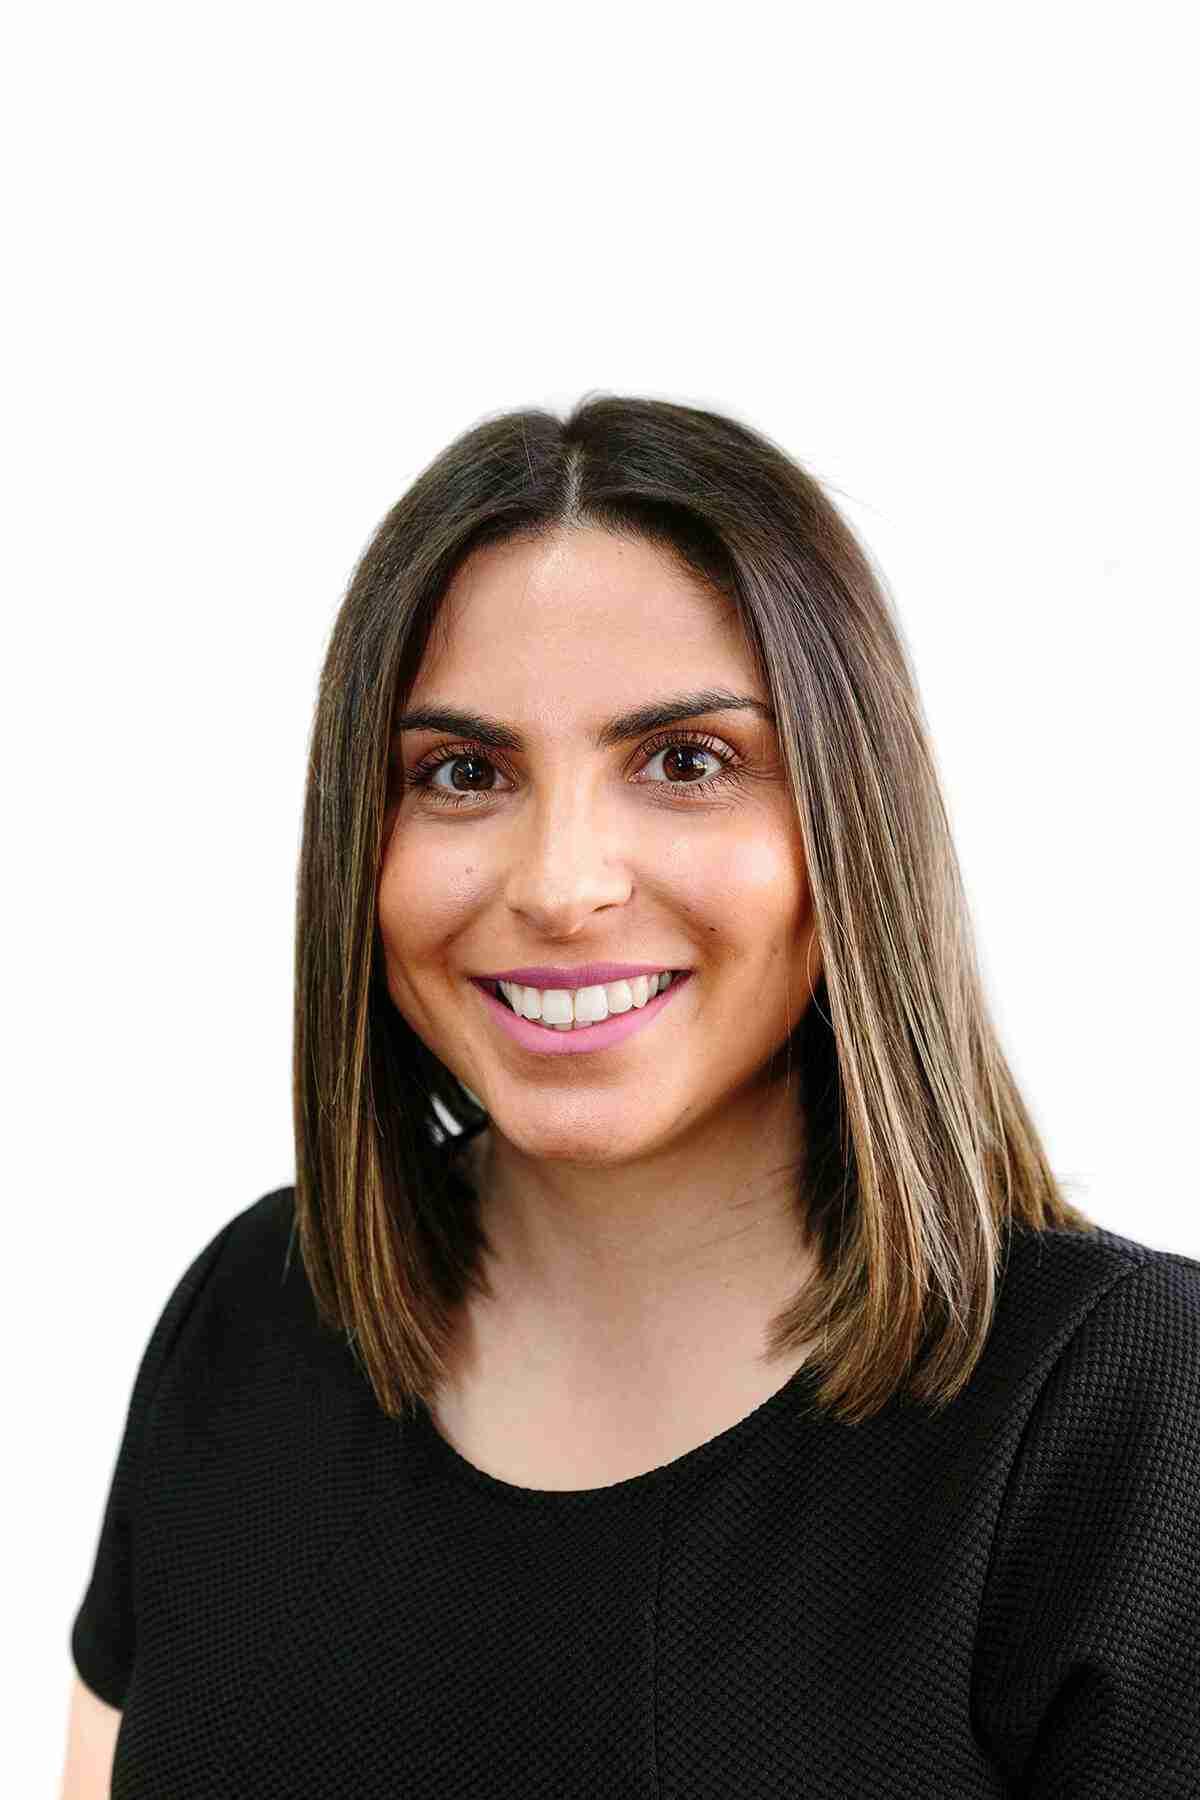 Jacinta Giammario